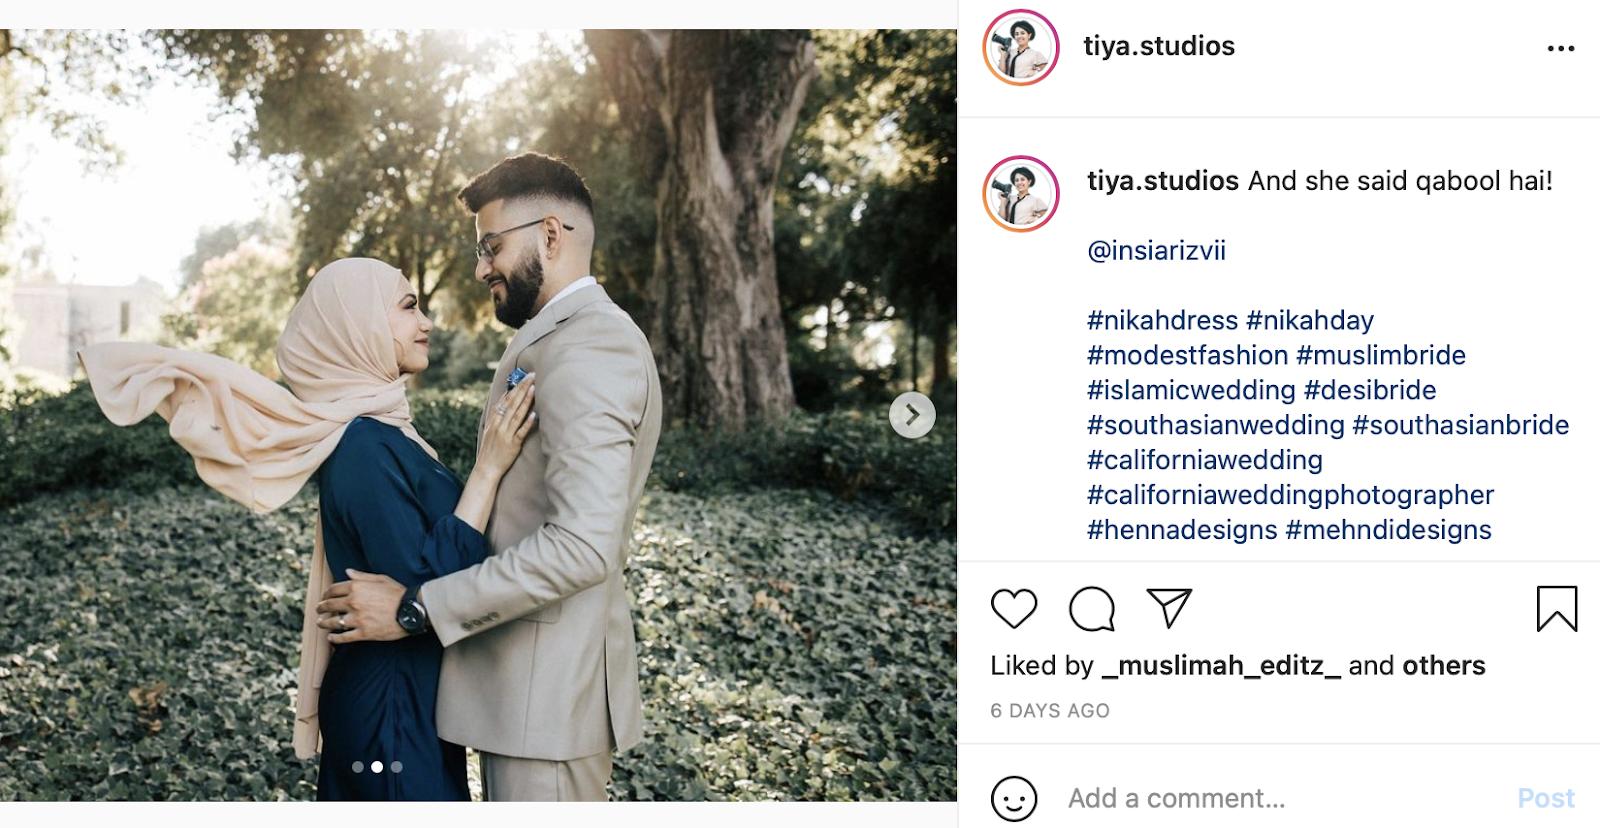 Islamic wedding photo